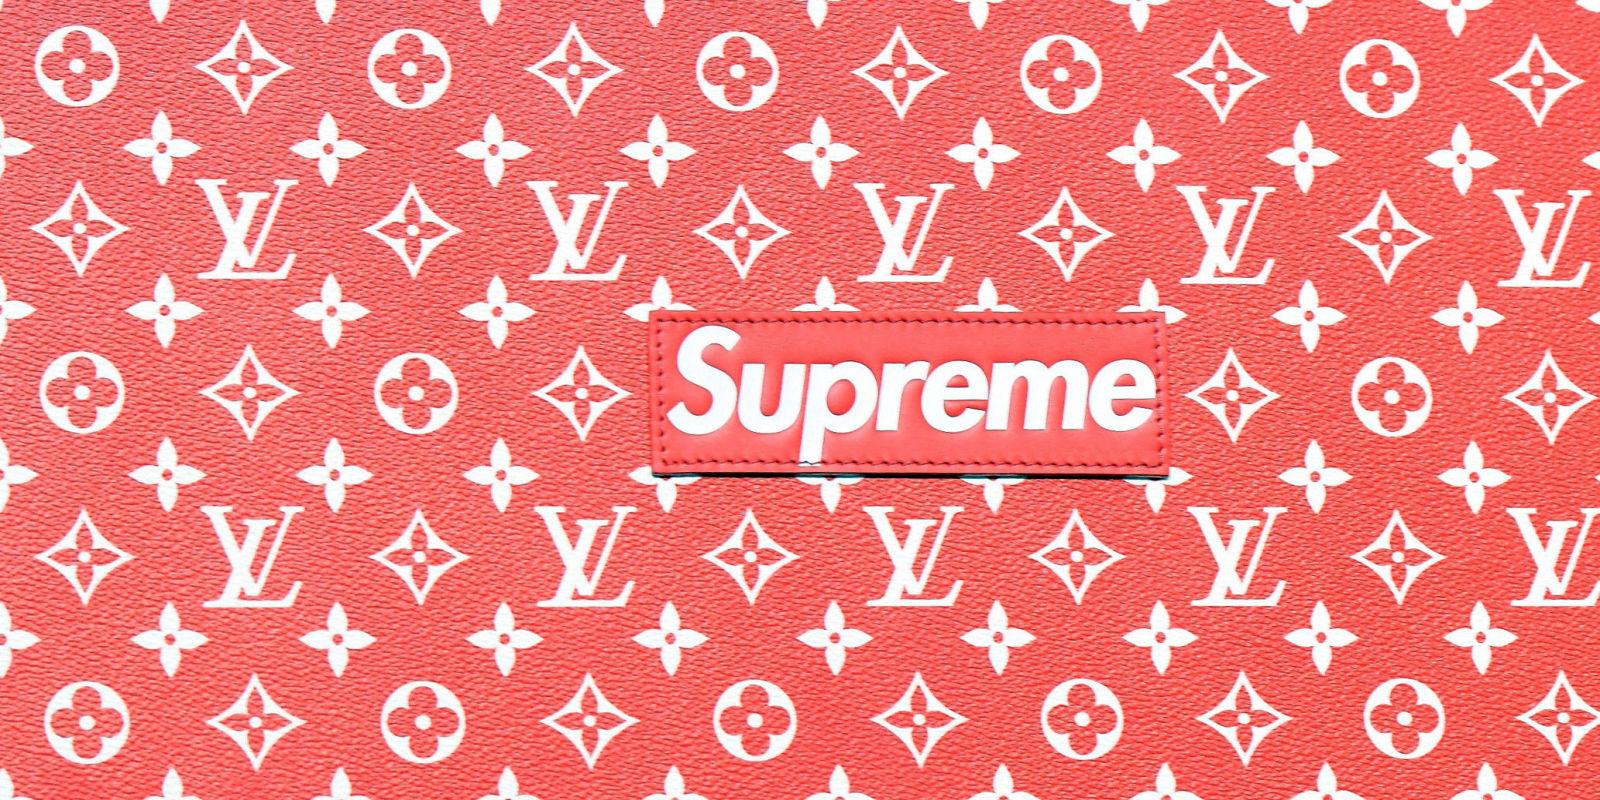 supreme x lv